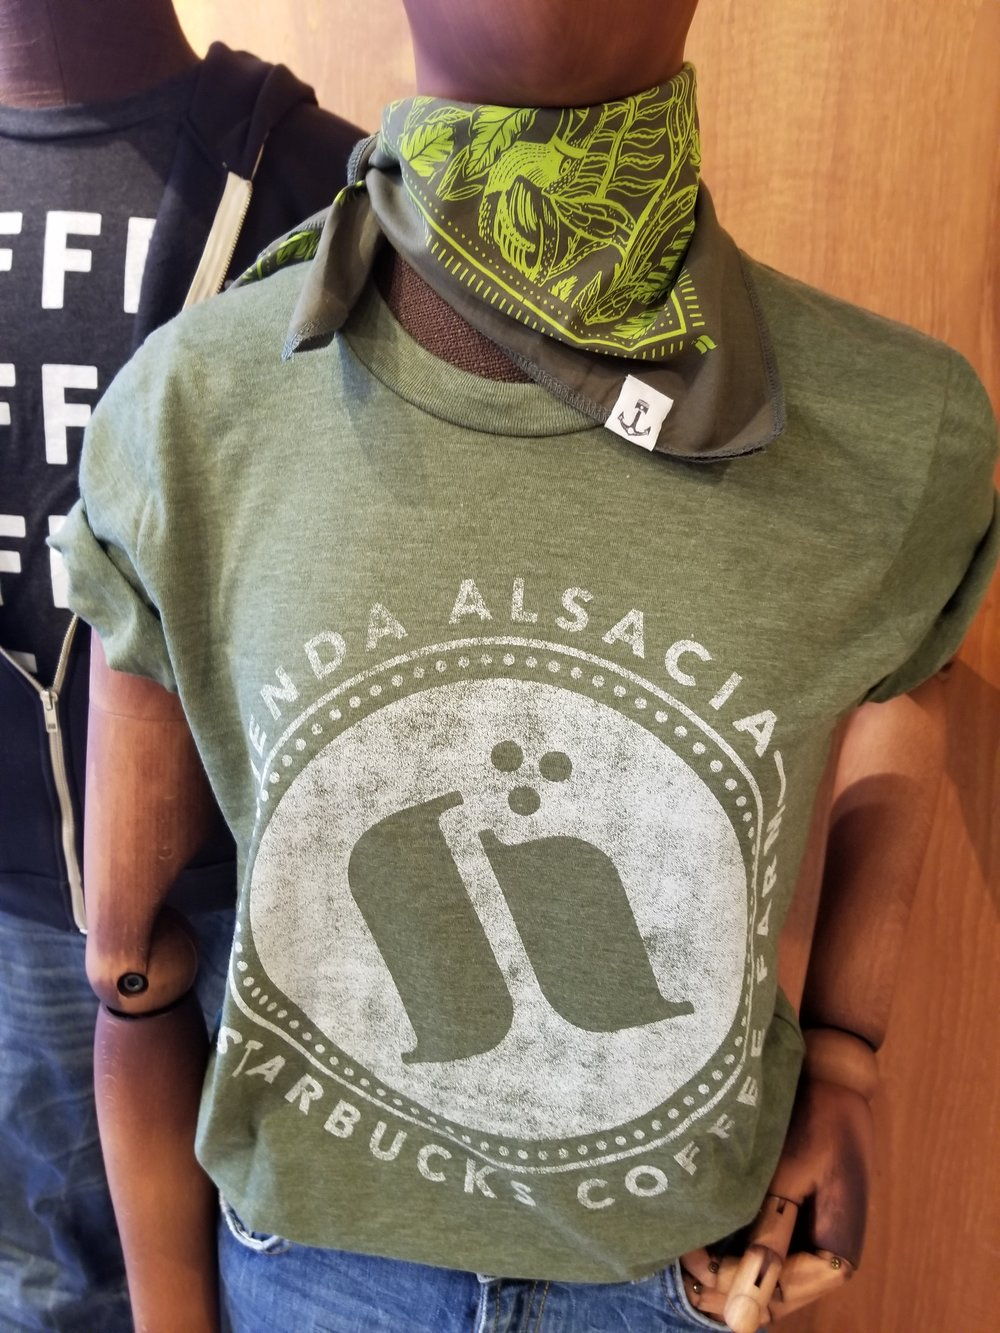 2018 March 7 Costa Rica Hacienda Alsacia t shirt 2.jpg